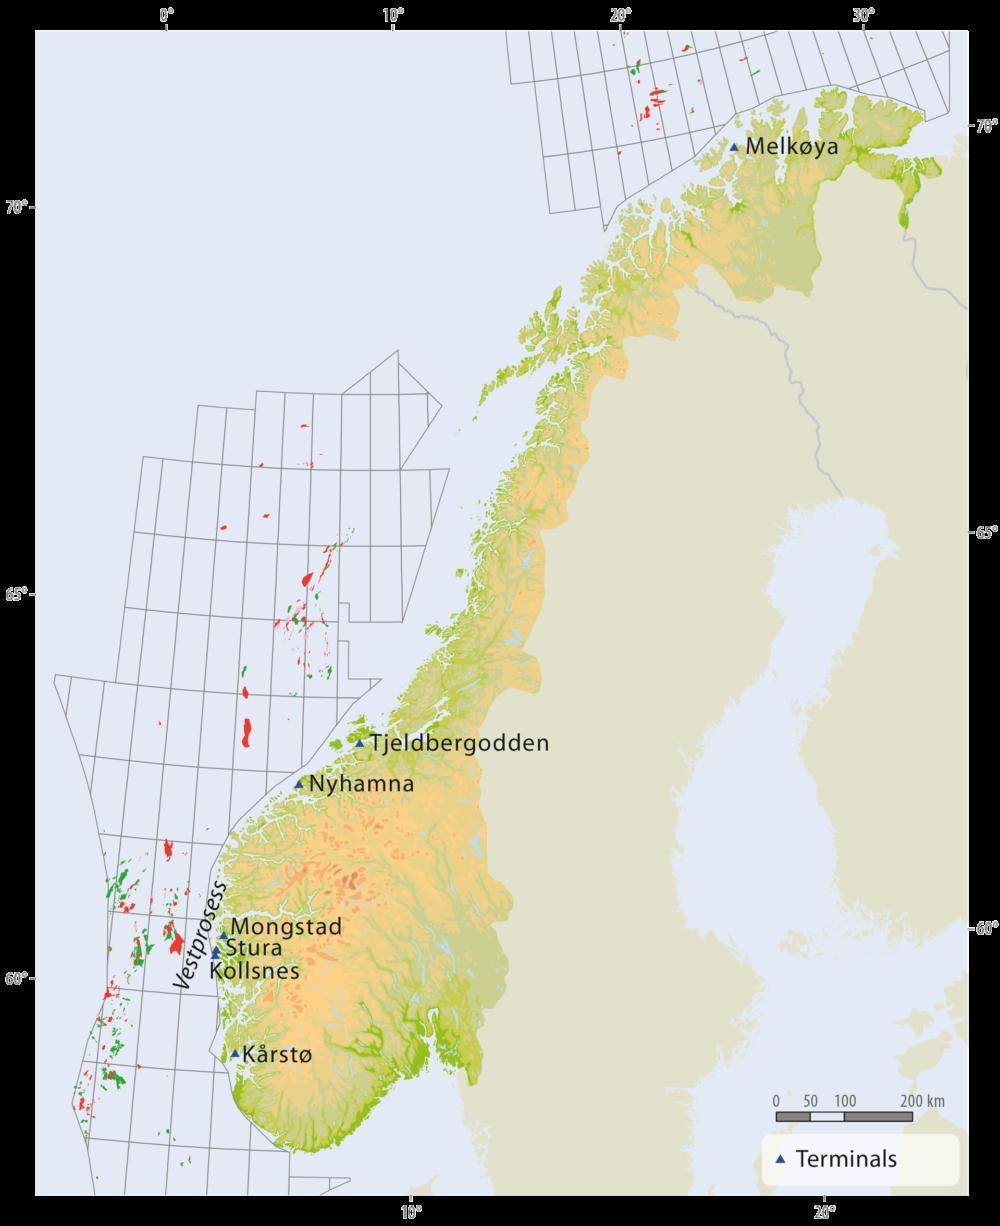 Onshore facilities in Norway